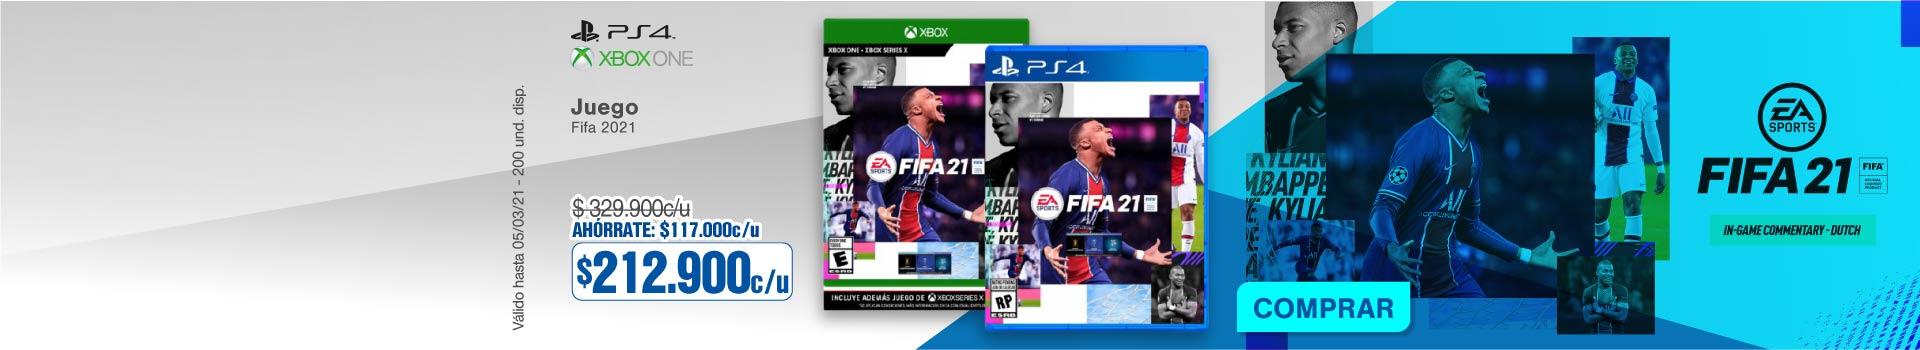 AK-VIDEOJUEGOS-BCAT1-PS4-FIFA2021-26FEBRERO2021